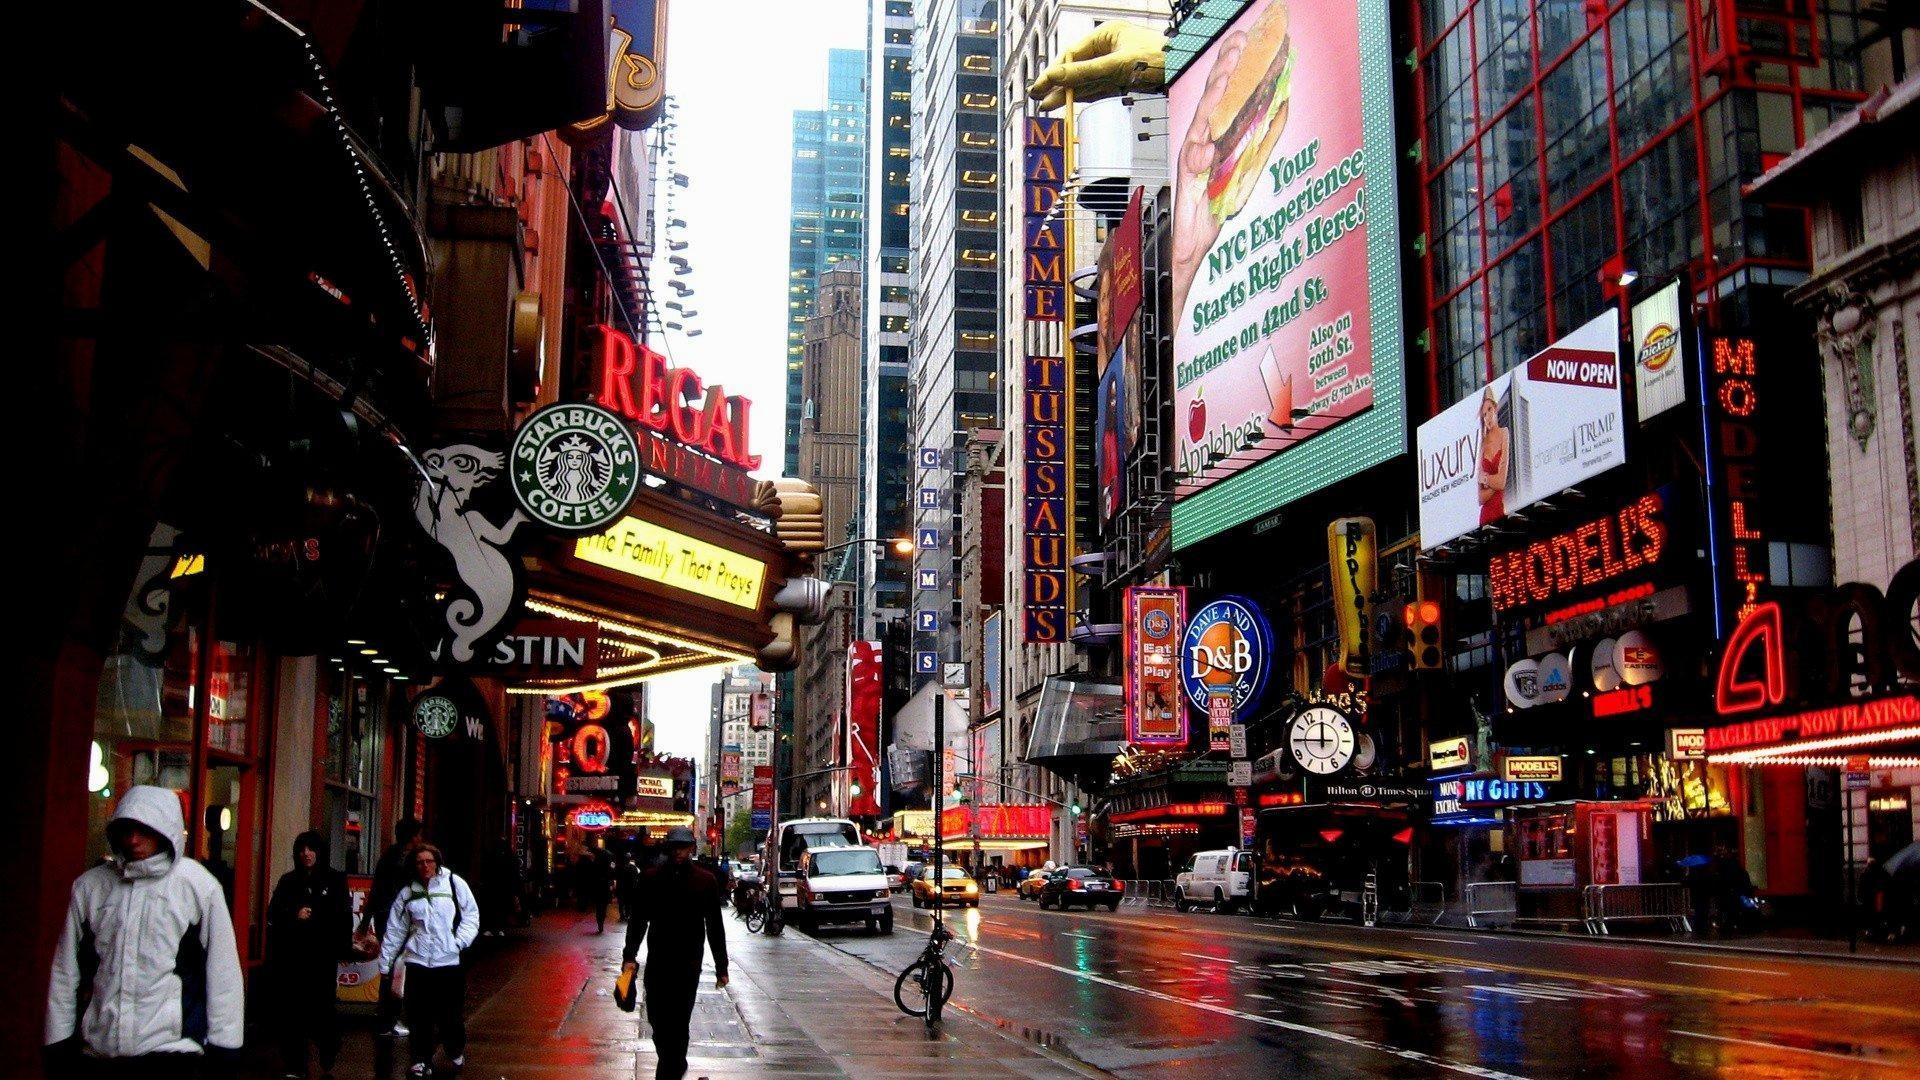 New-york-city-street-wallpaper-hd-images